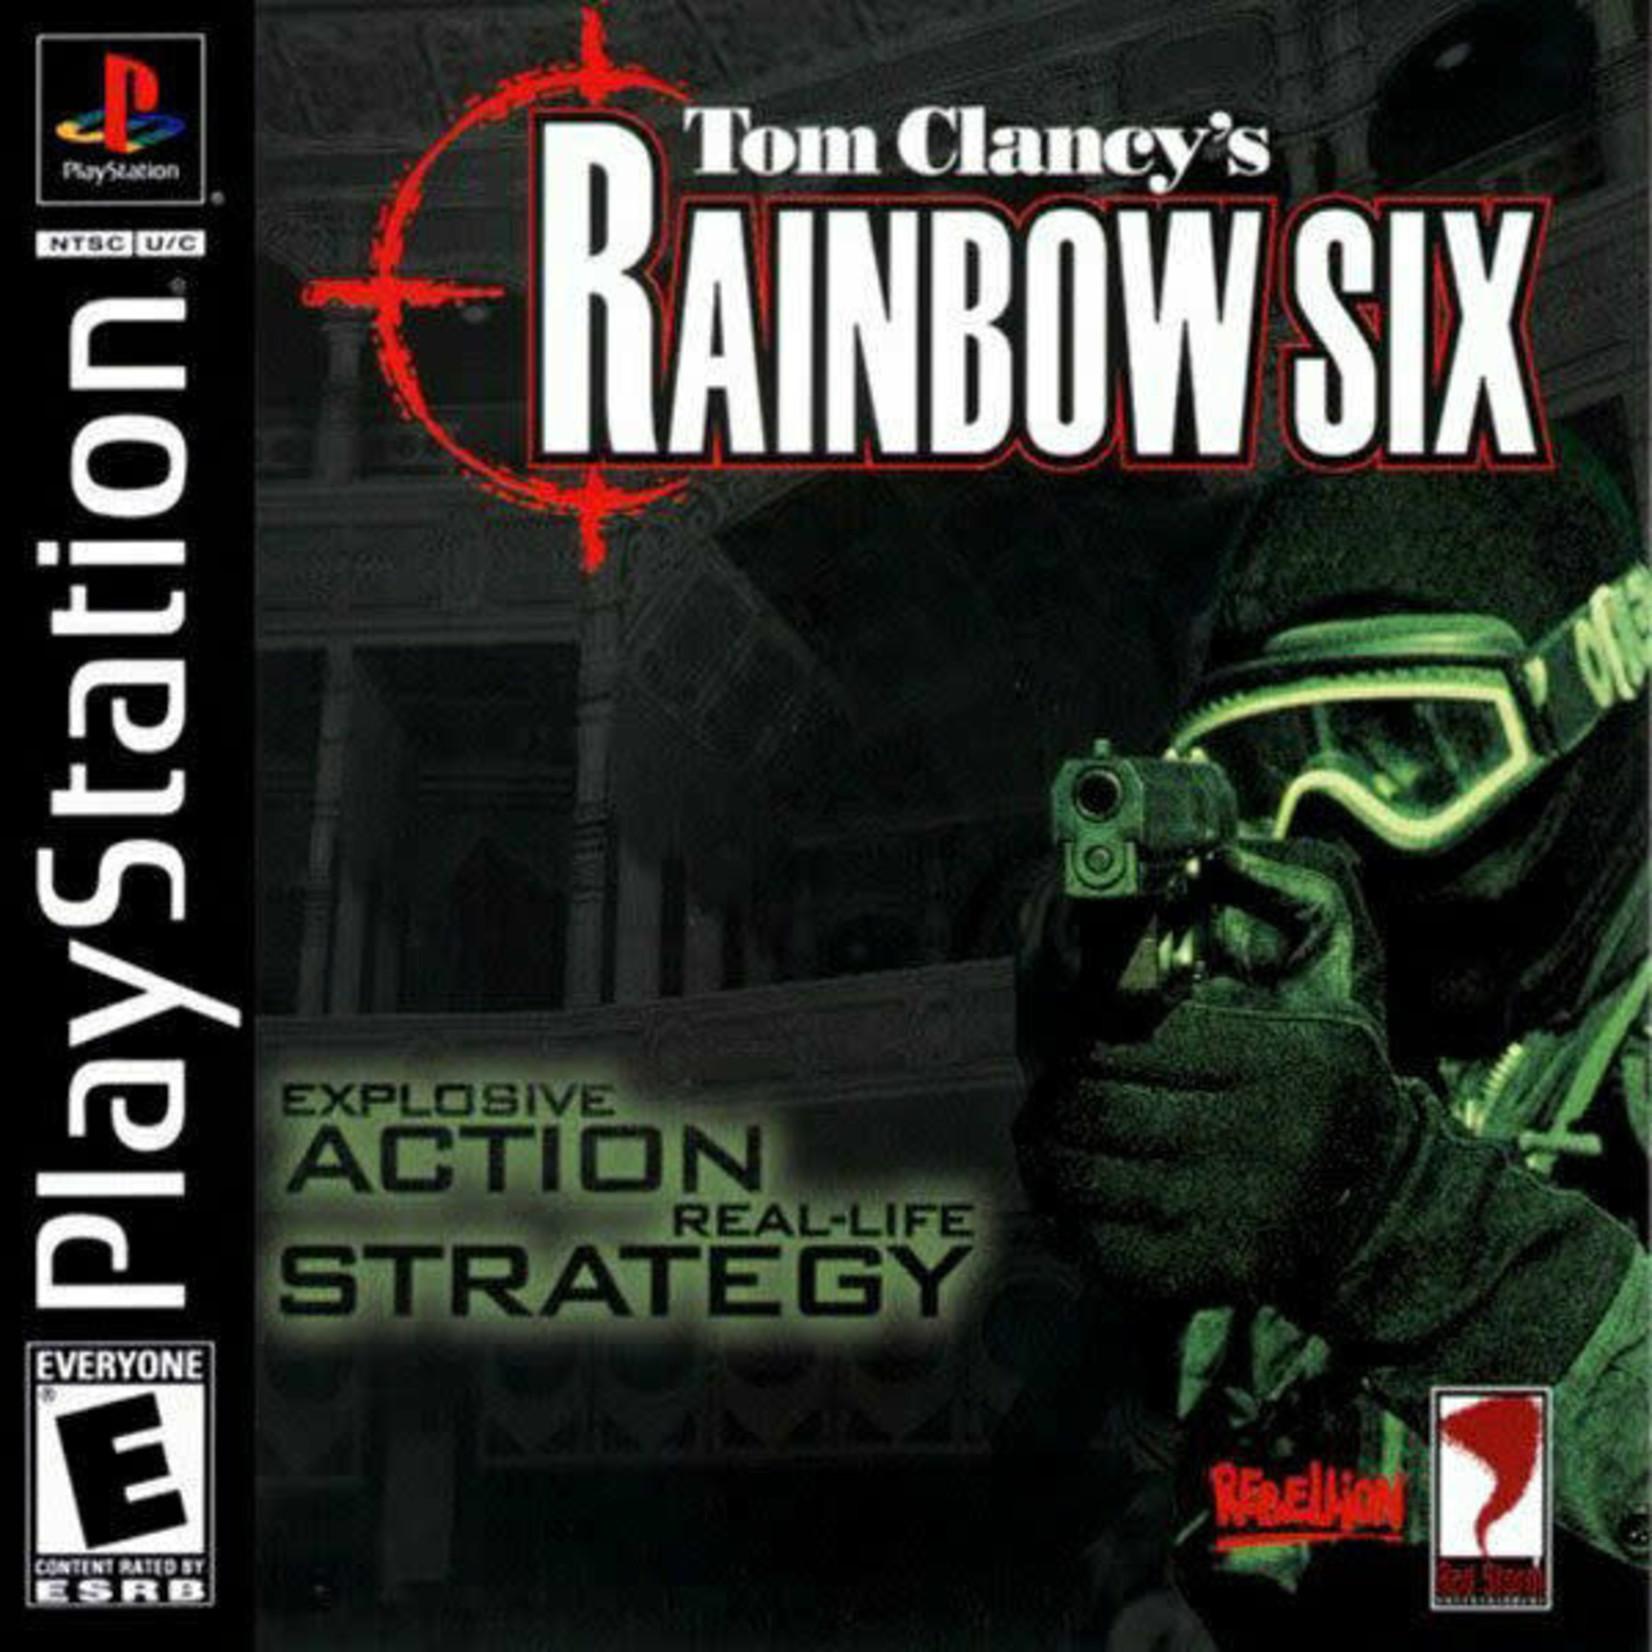 ps1u-Rainbow Six